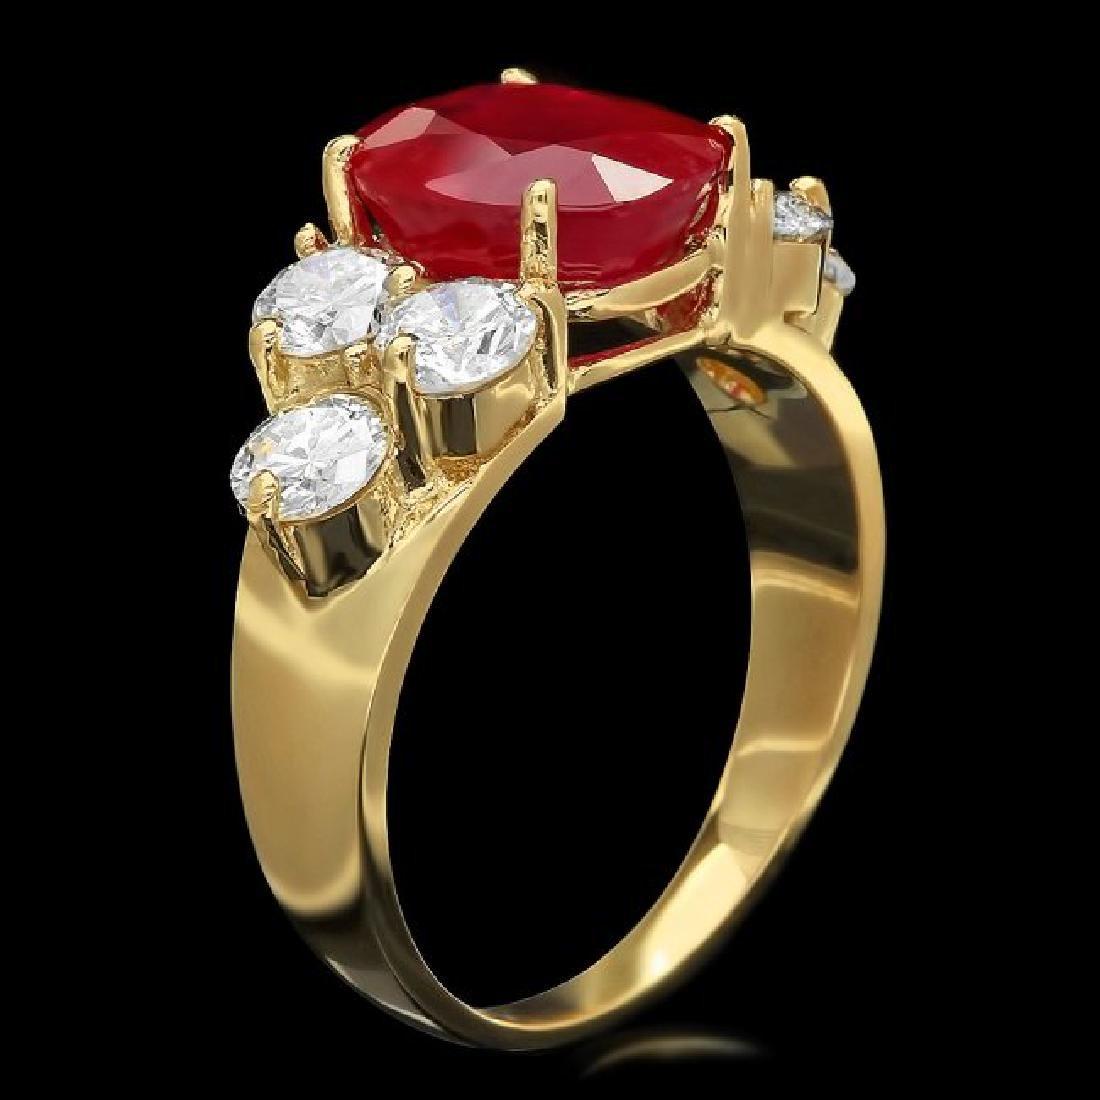 14k Yellow Gold 4.00ct Ruby 1.35ct Diamond Ring - 2